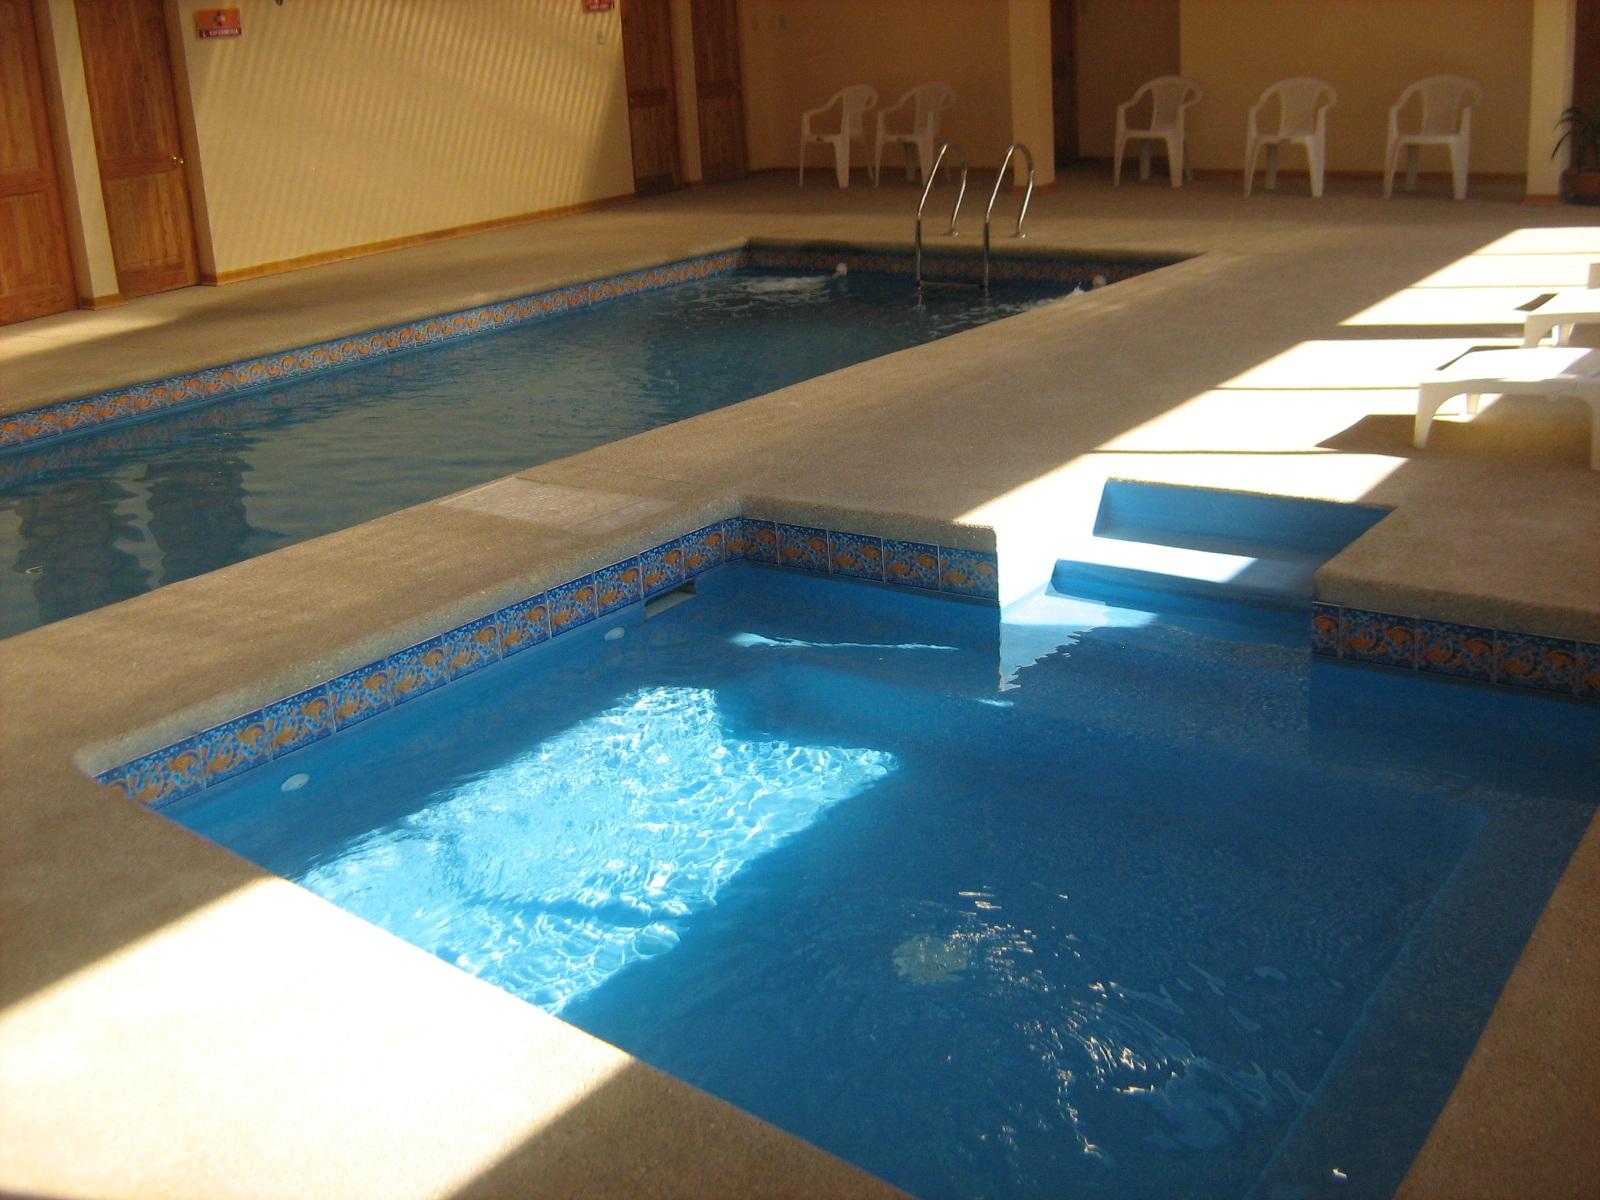 Construccion pascal hermanos ltda arquitectura for Construccion piscina temperada